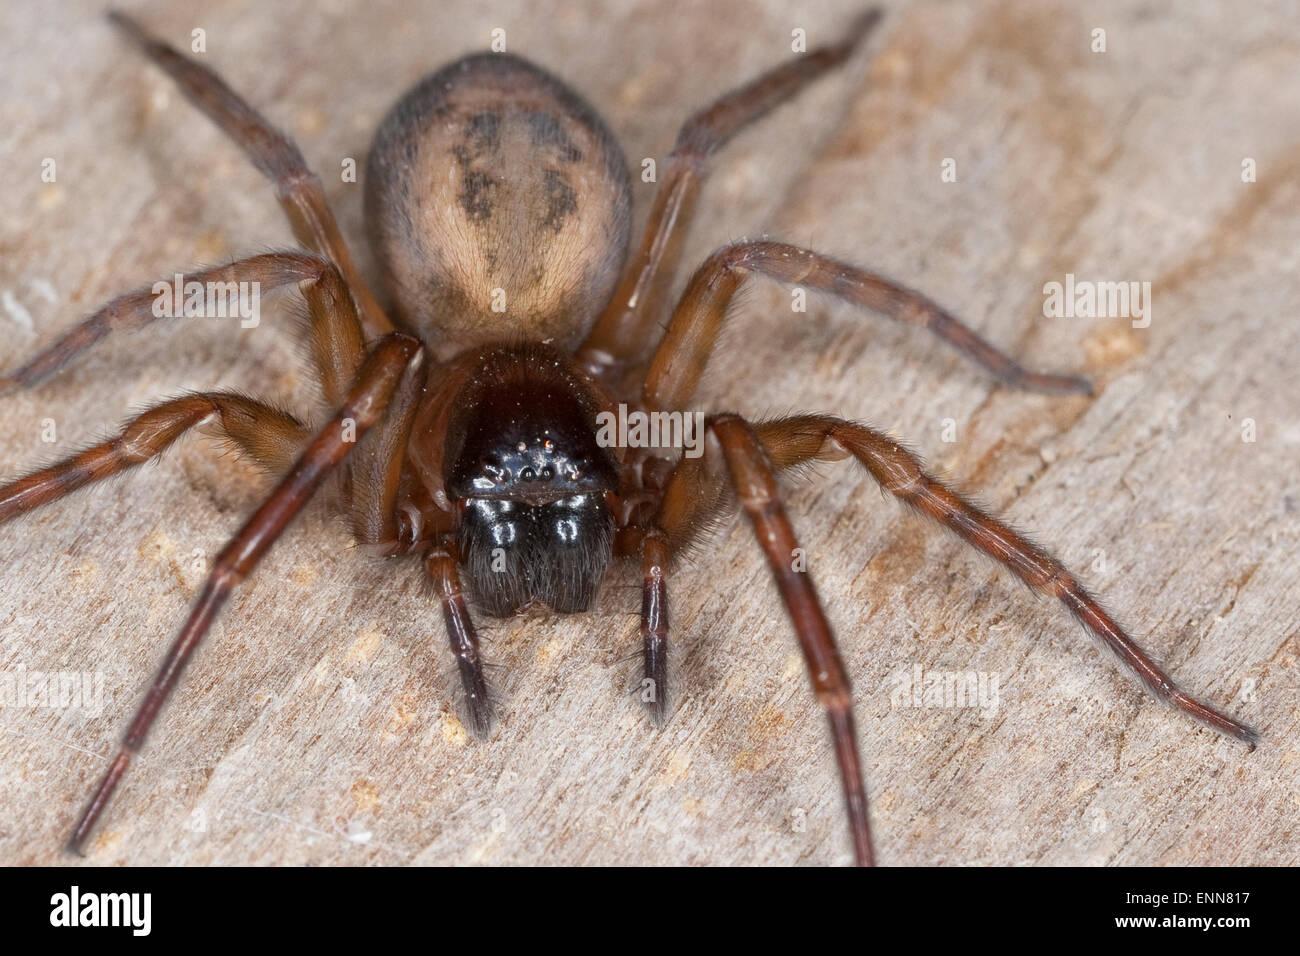 Lace weaver spider, House spider, female, Fensterspinne, Finsterspinne, Kellerspinne, Portrait, Weibchen, Amaurobius - Stock Image